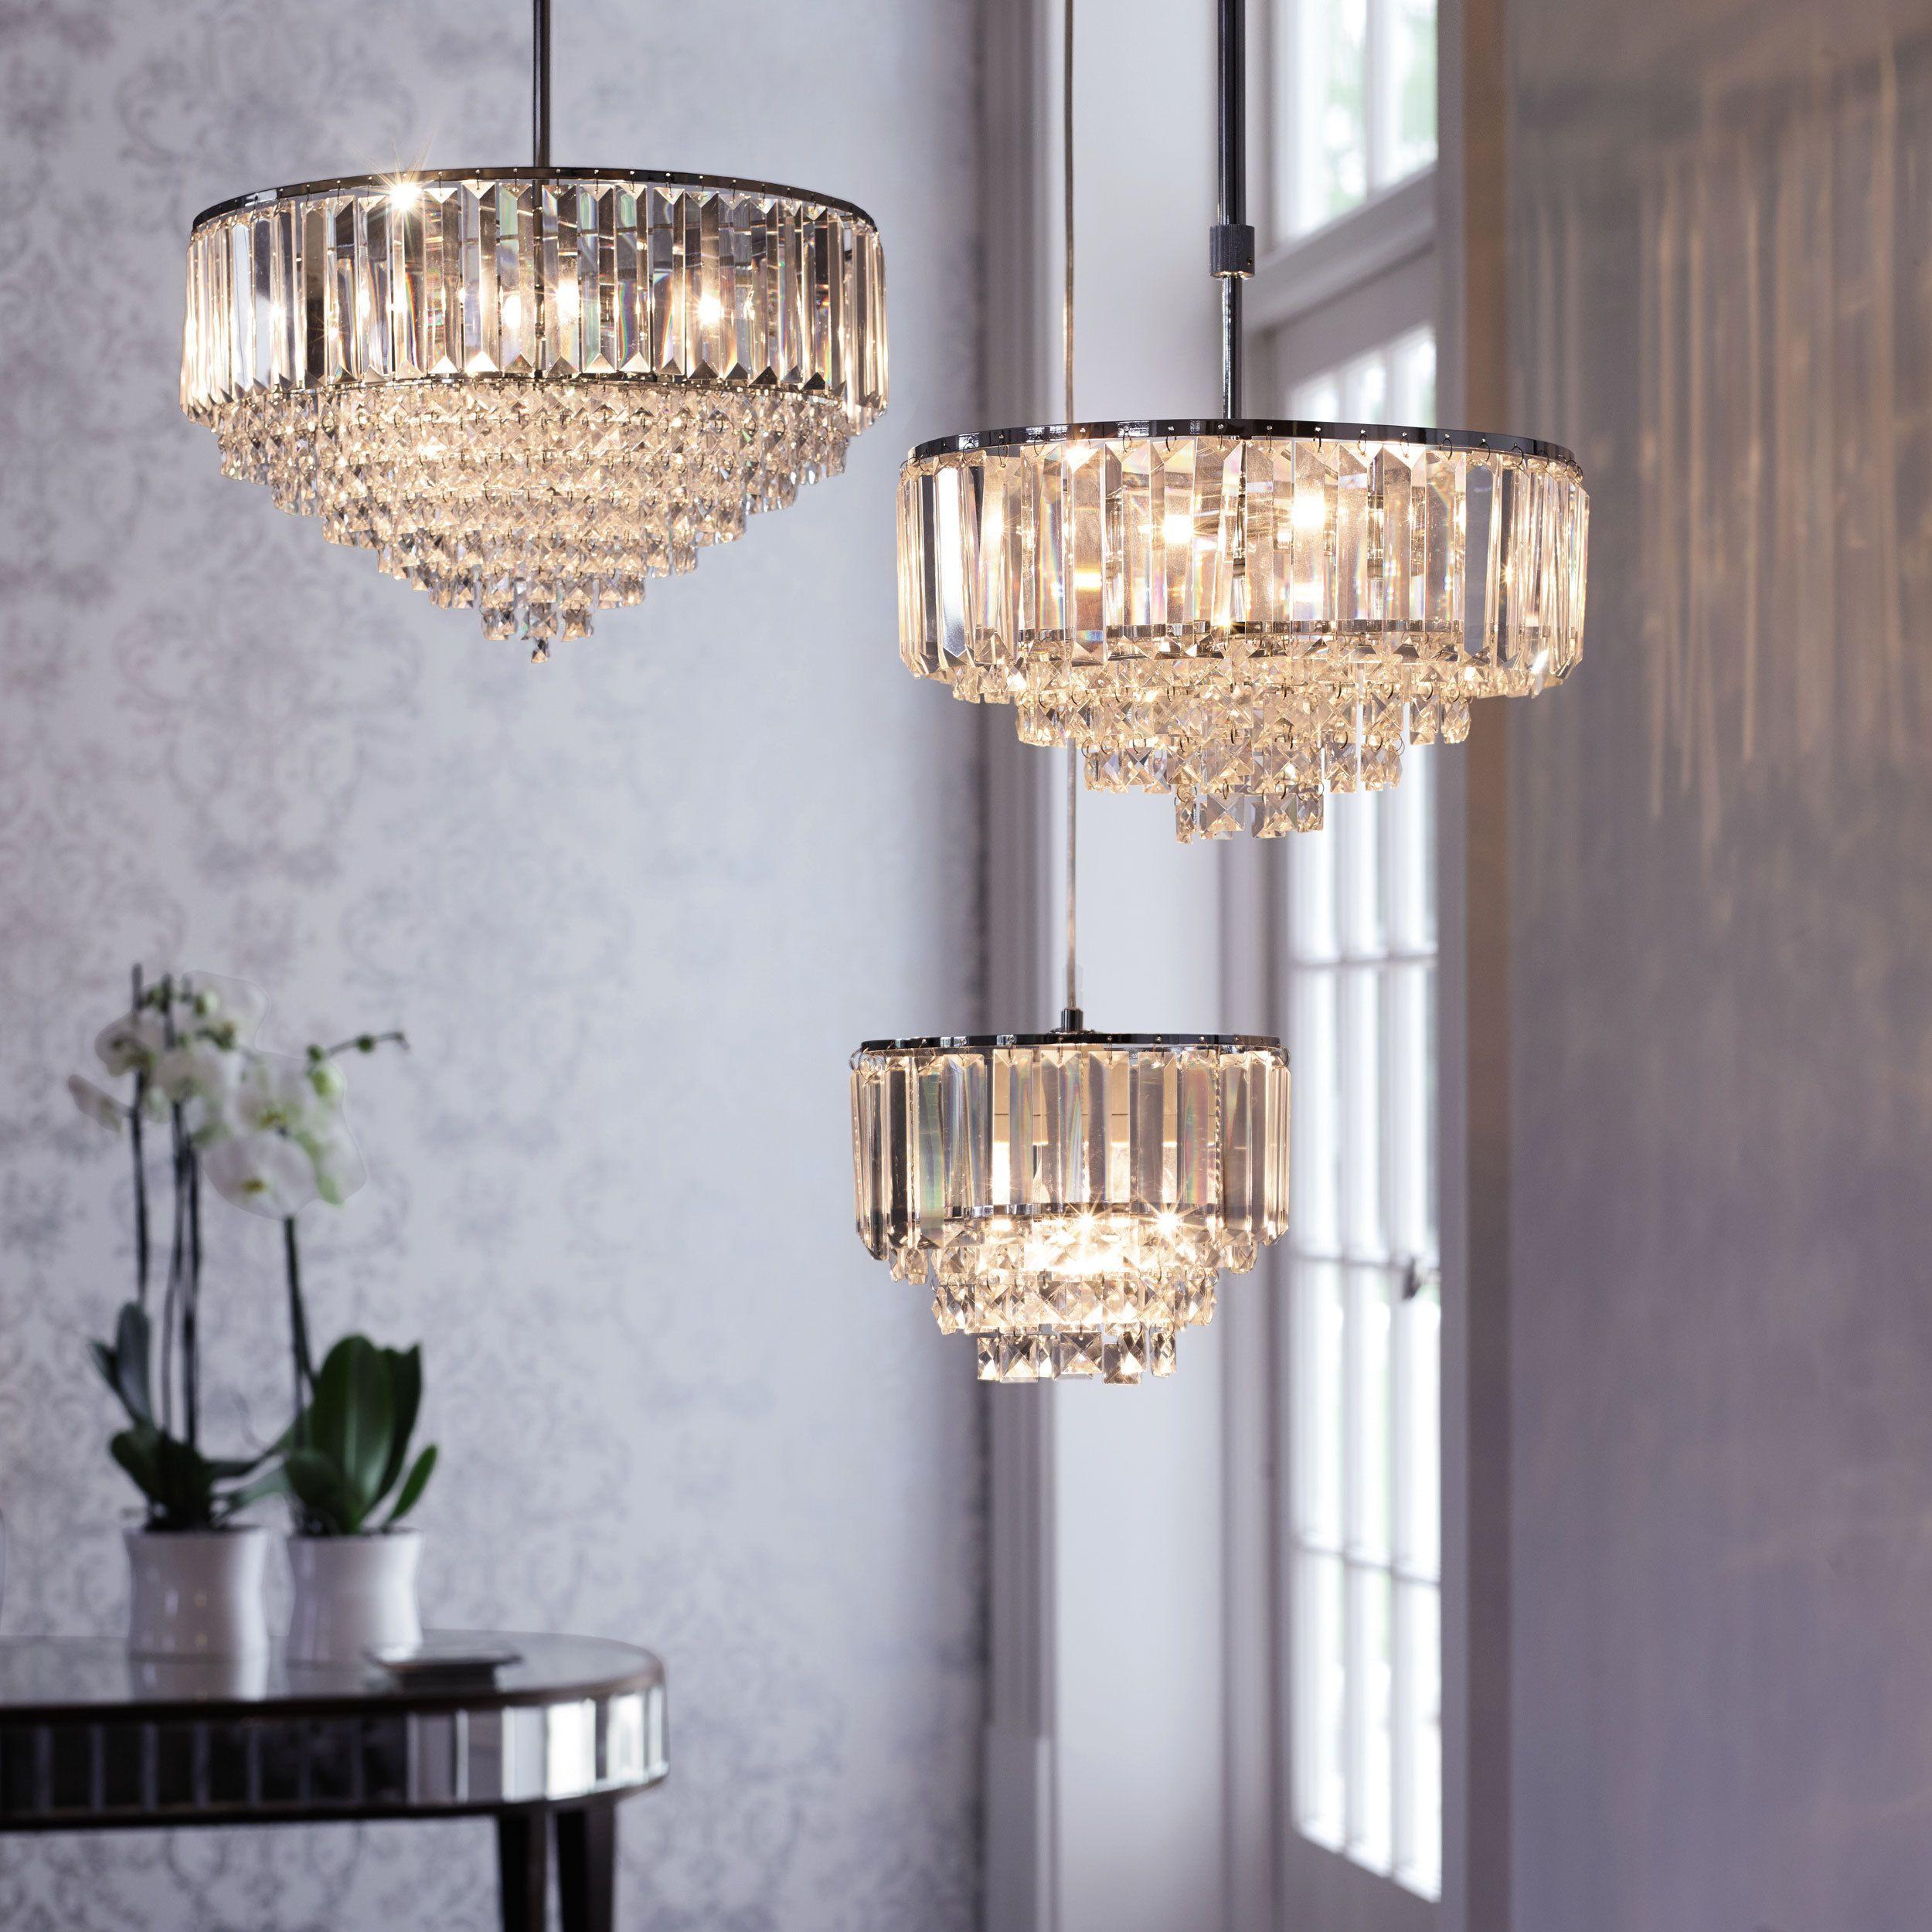 Vienna Easy-Fit Pendant Light Laura Ashley | Hallway inspiration ...